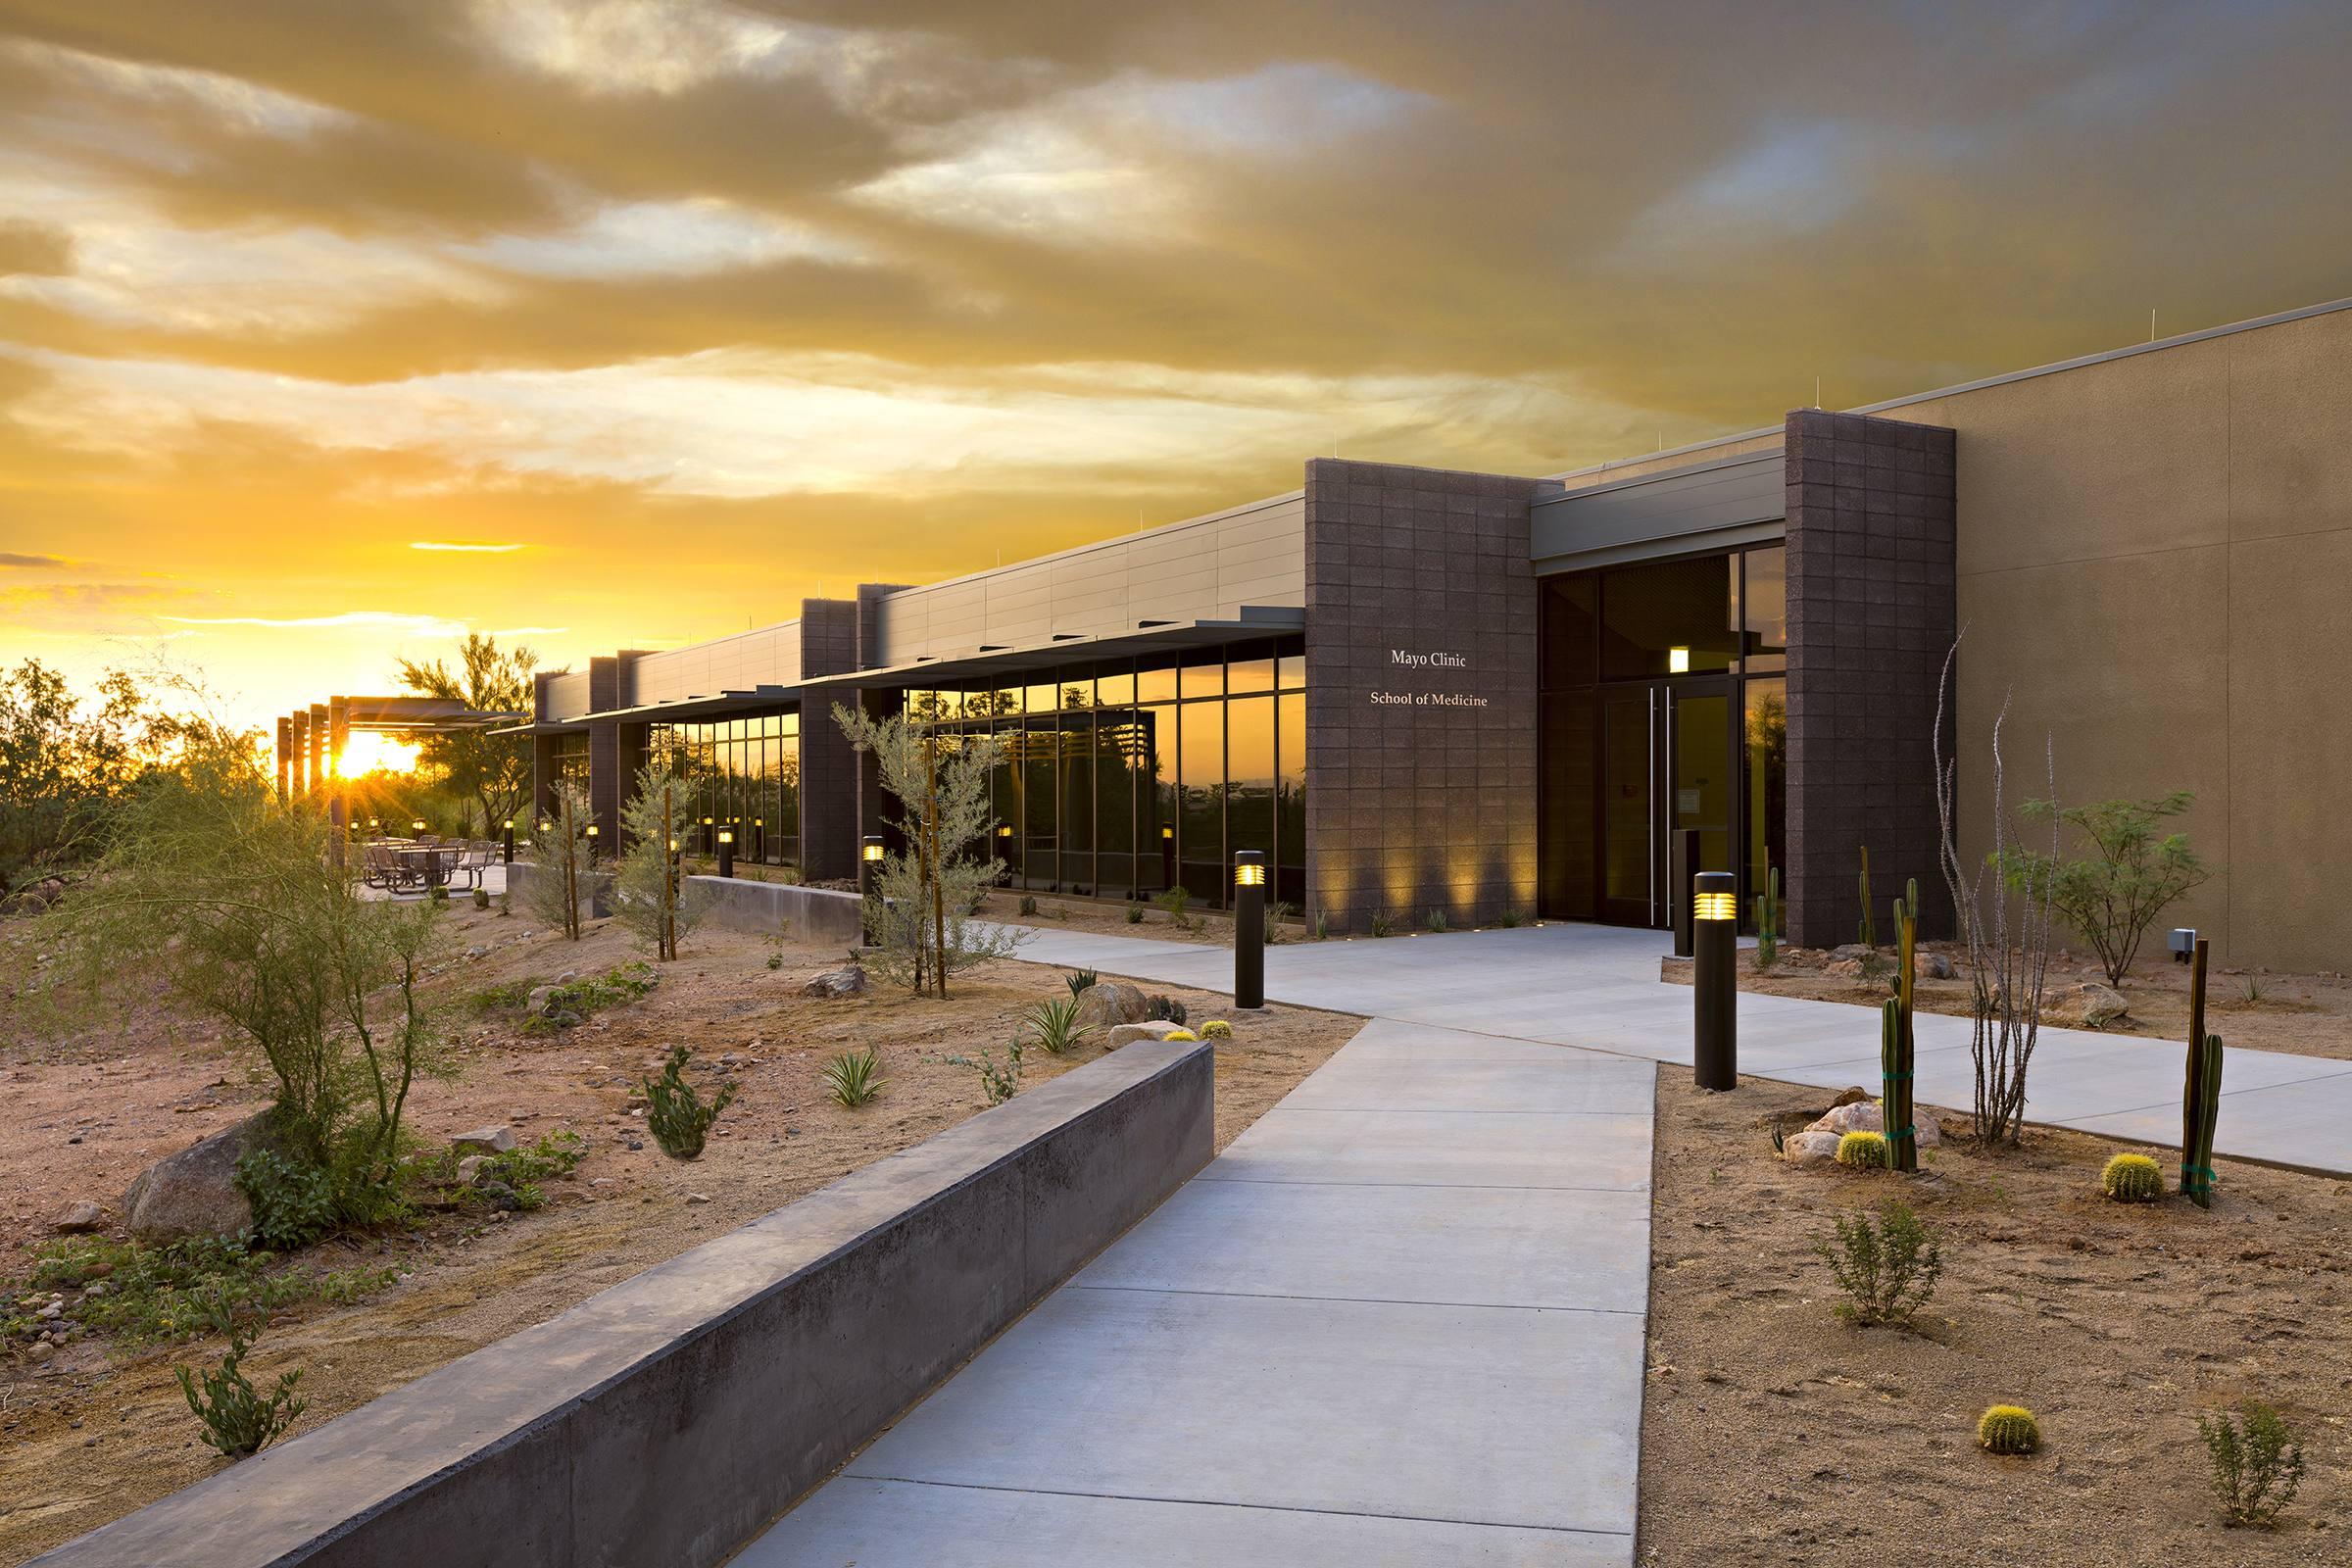 Mayo Clinic School of Medicine - Arizona campus